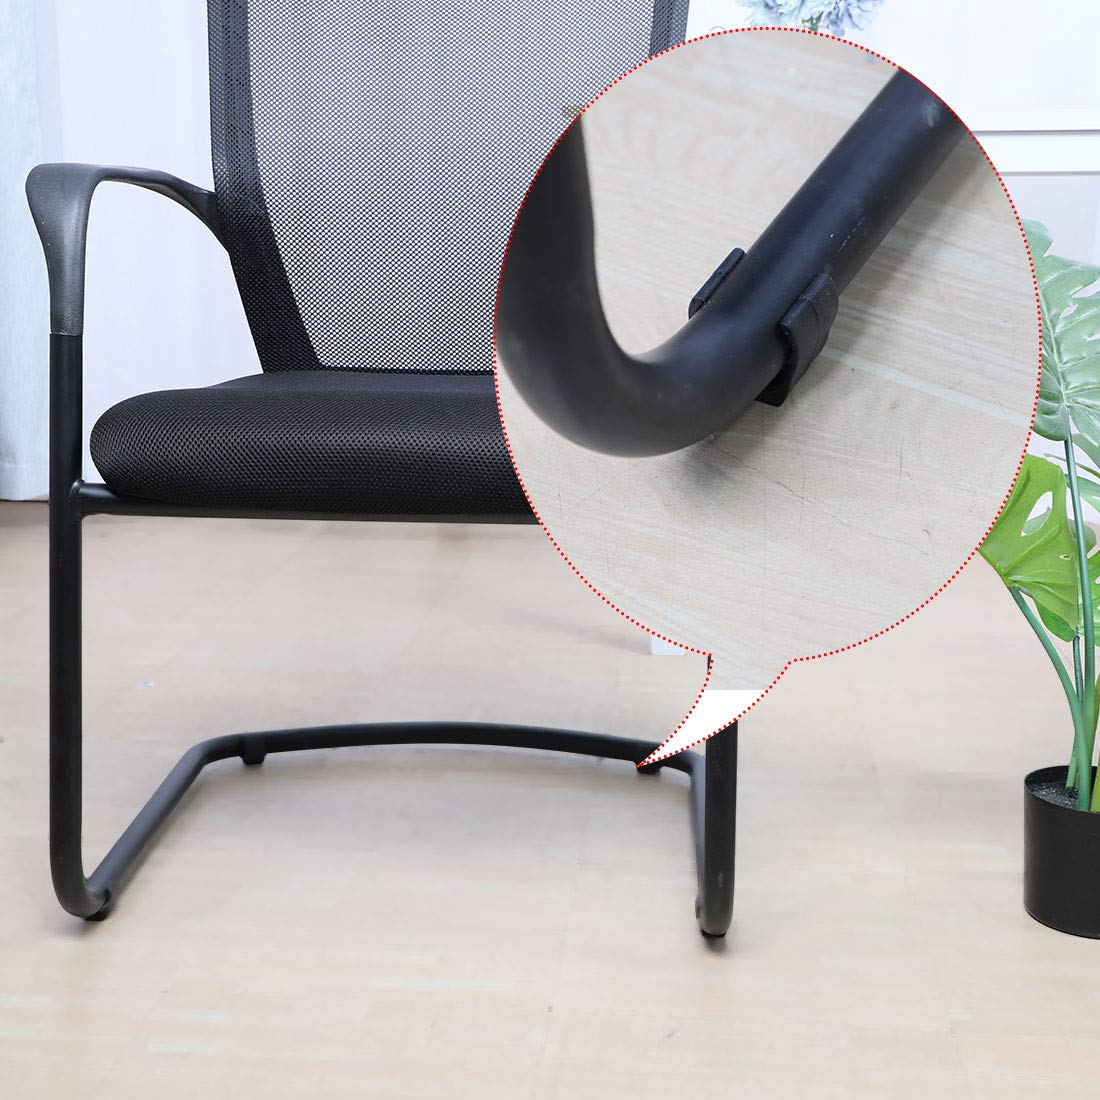 uxcell/® Breuer Chair Foot Floor Glides Single Prong U-Shape Caps 20mm 10 Pcs